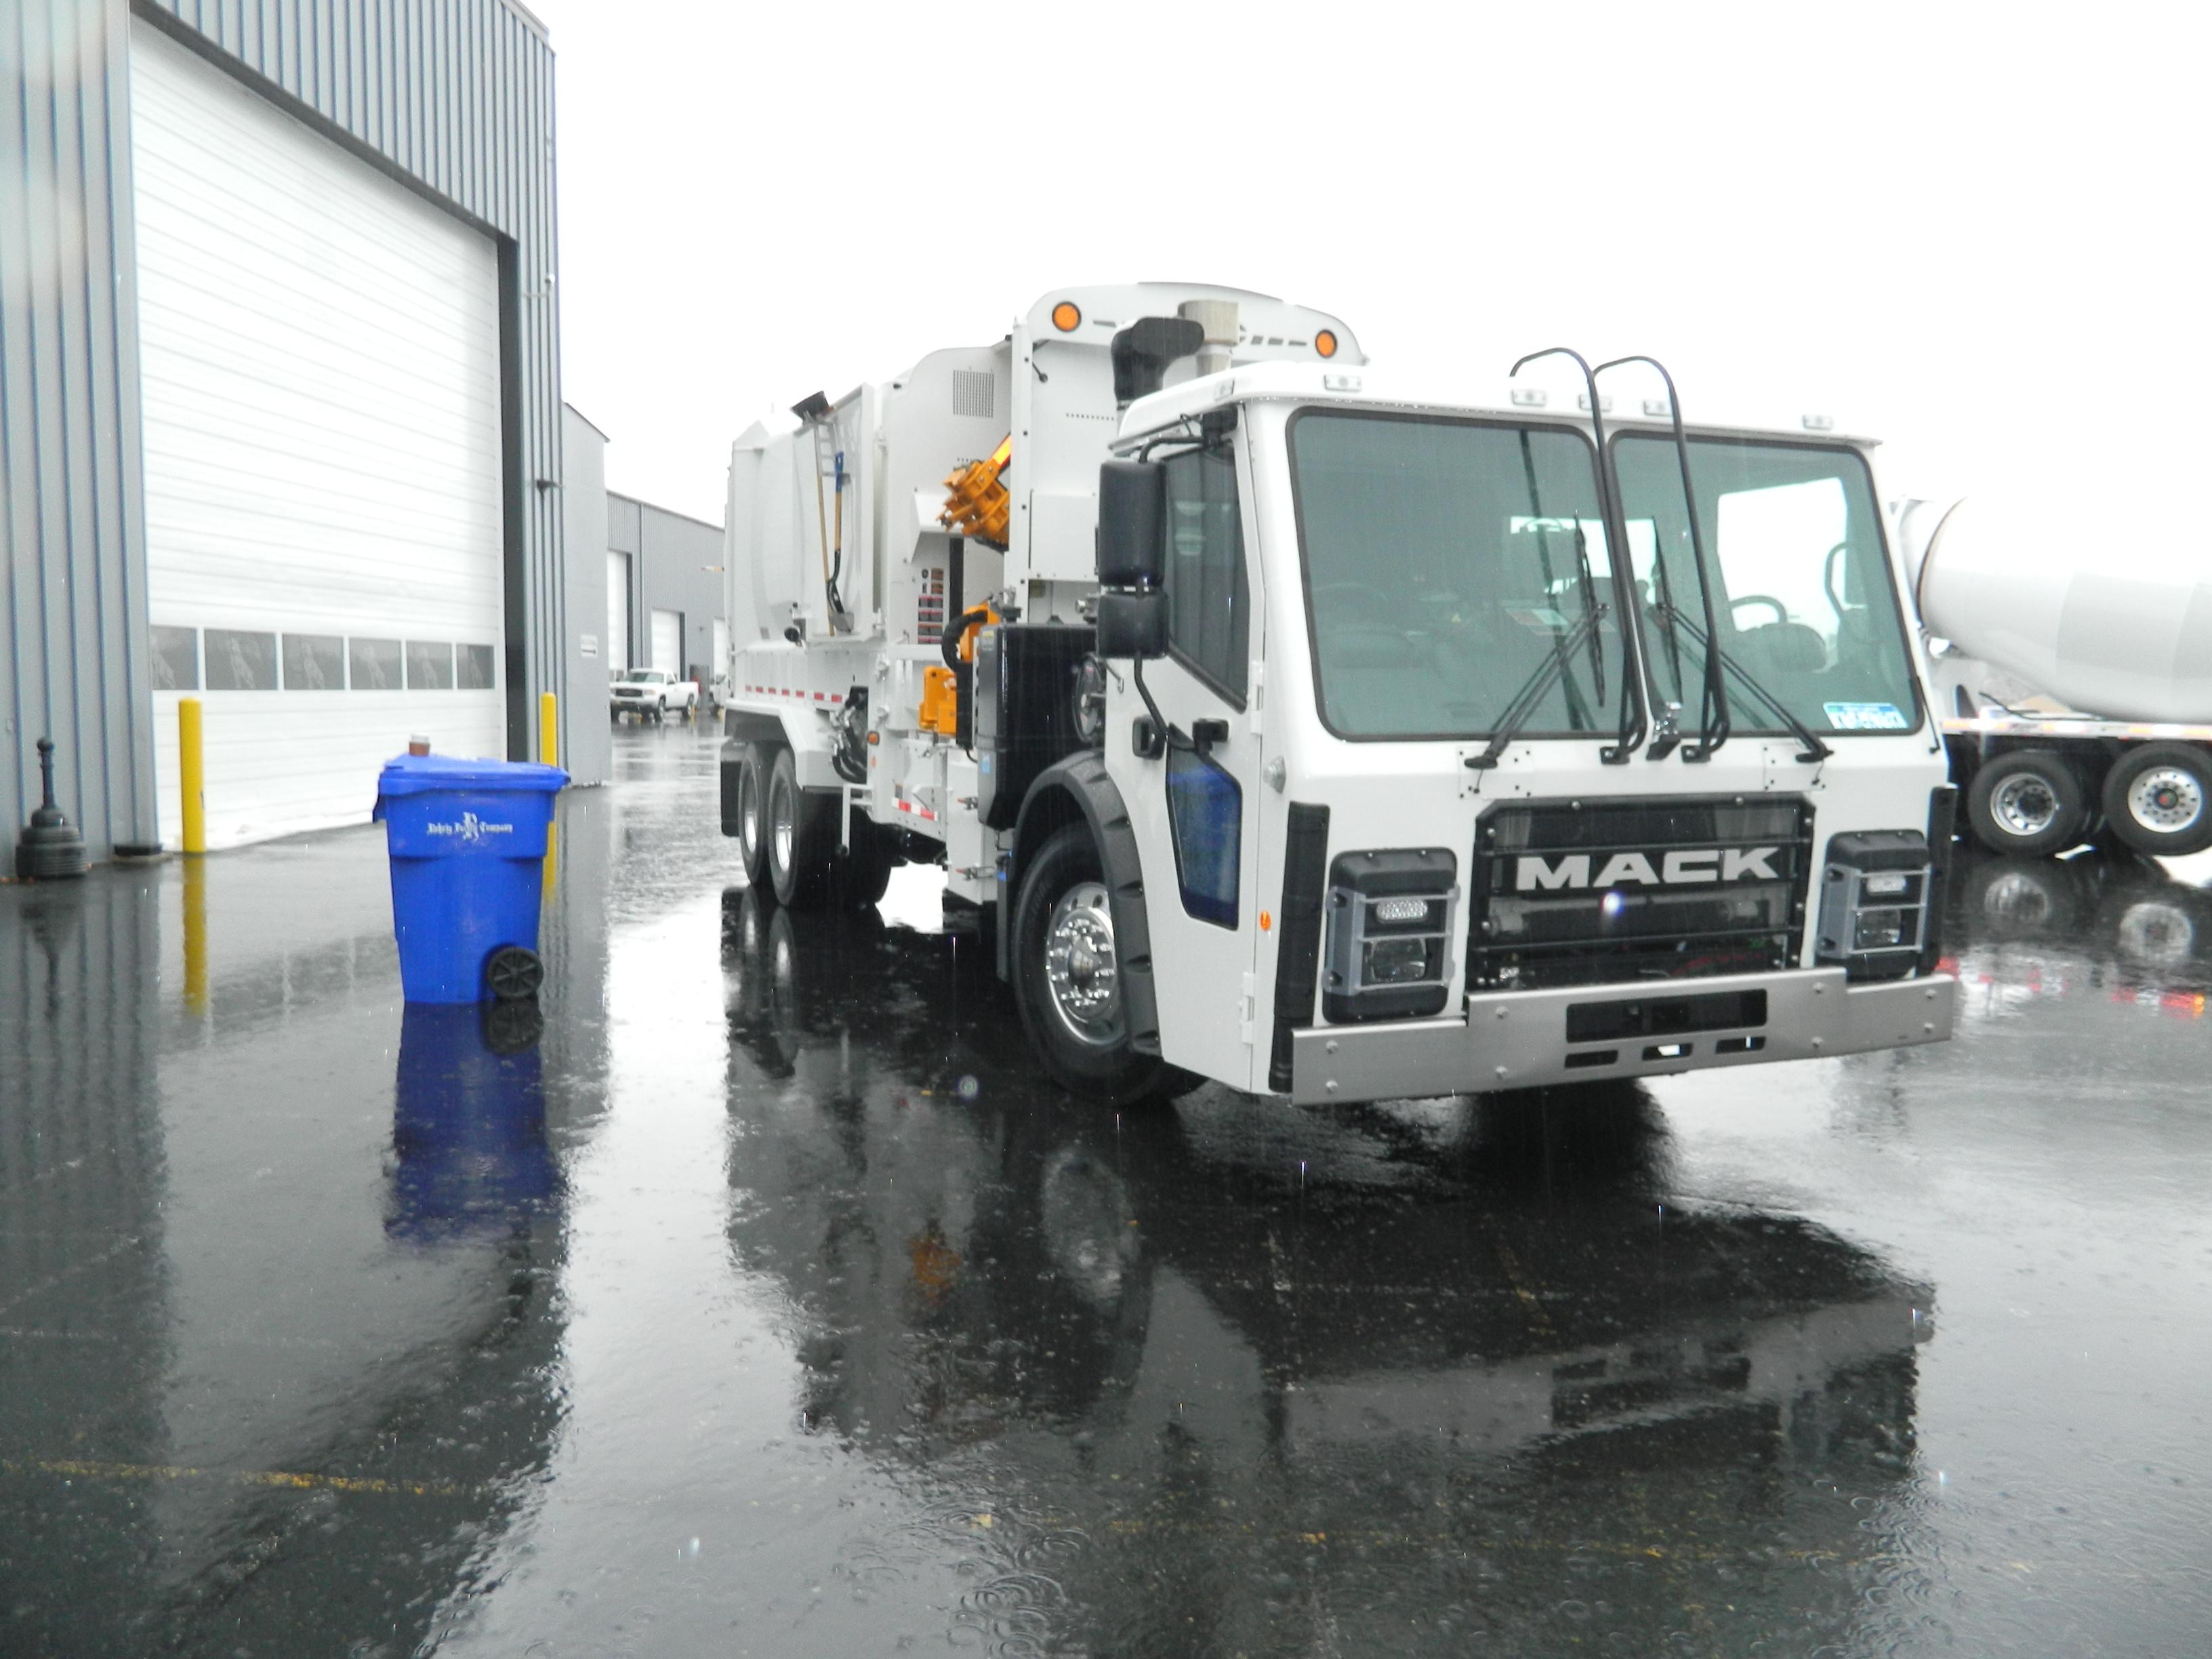 Driving The New Mack Lr Refuse Truck Truck News